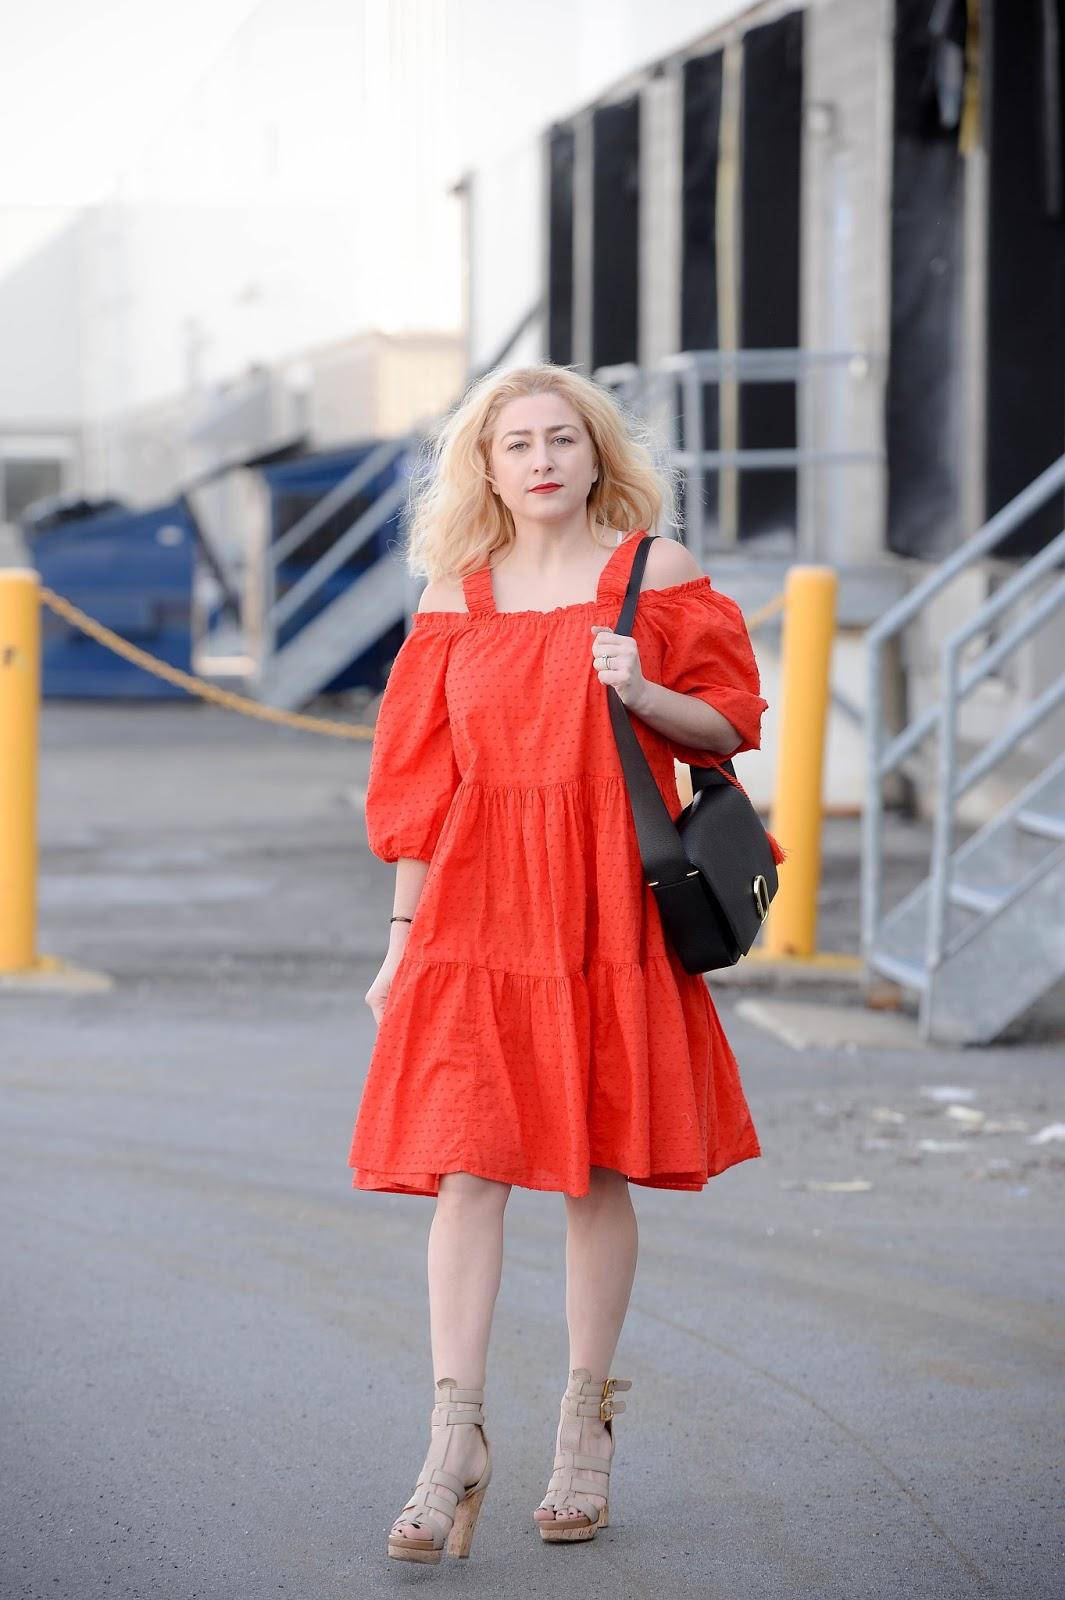 05c14086ddb5 Dress: H&M / Shoes: Chloe (super old) / Bag: 3.1 Phillip Lim